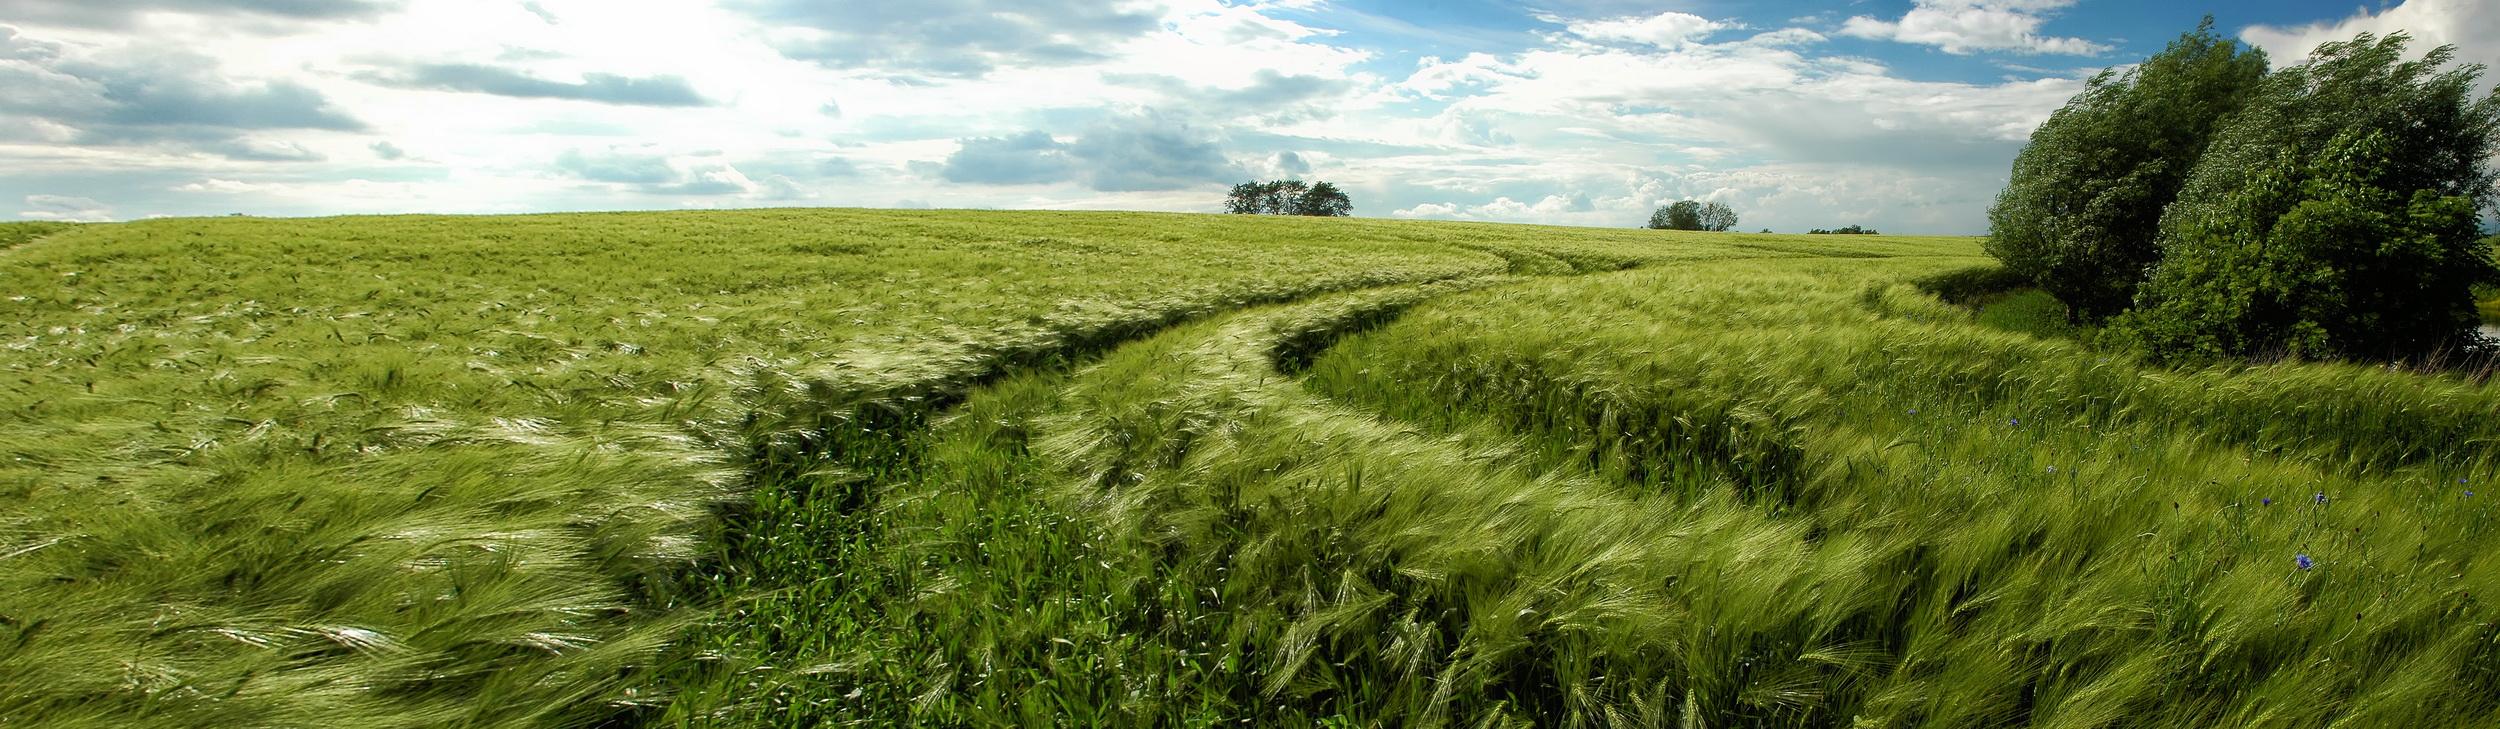 Feld bei Stavenhagen